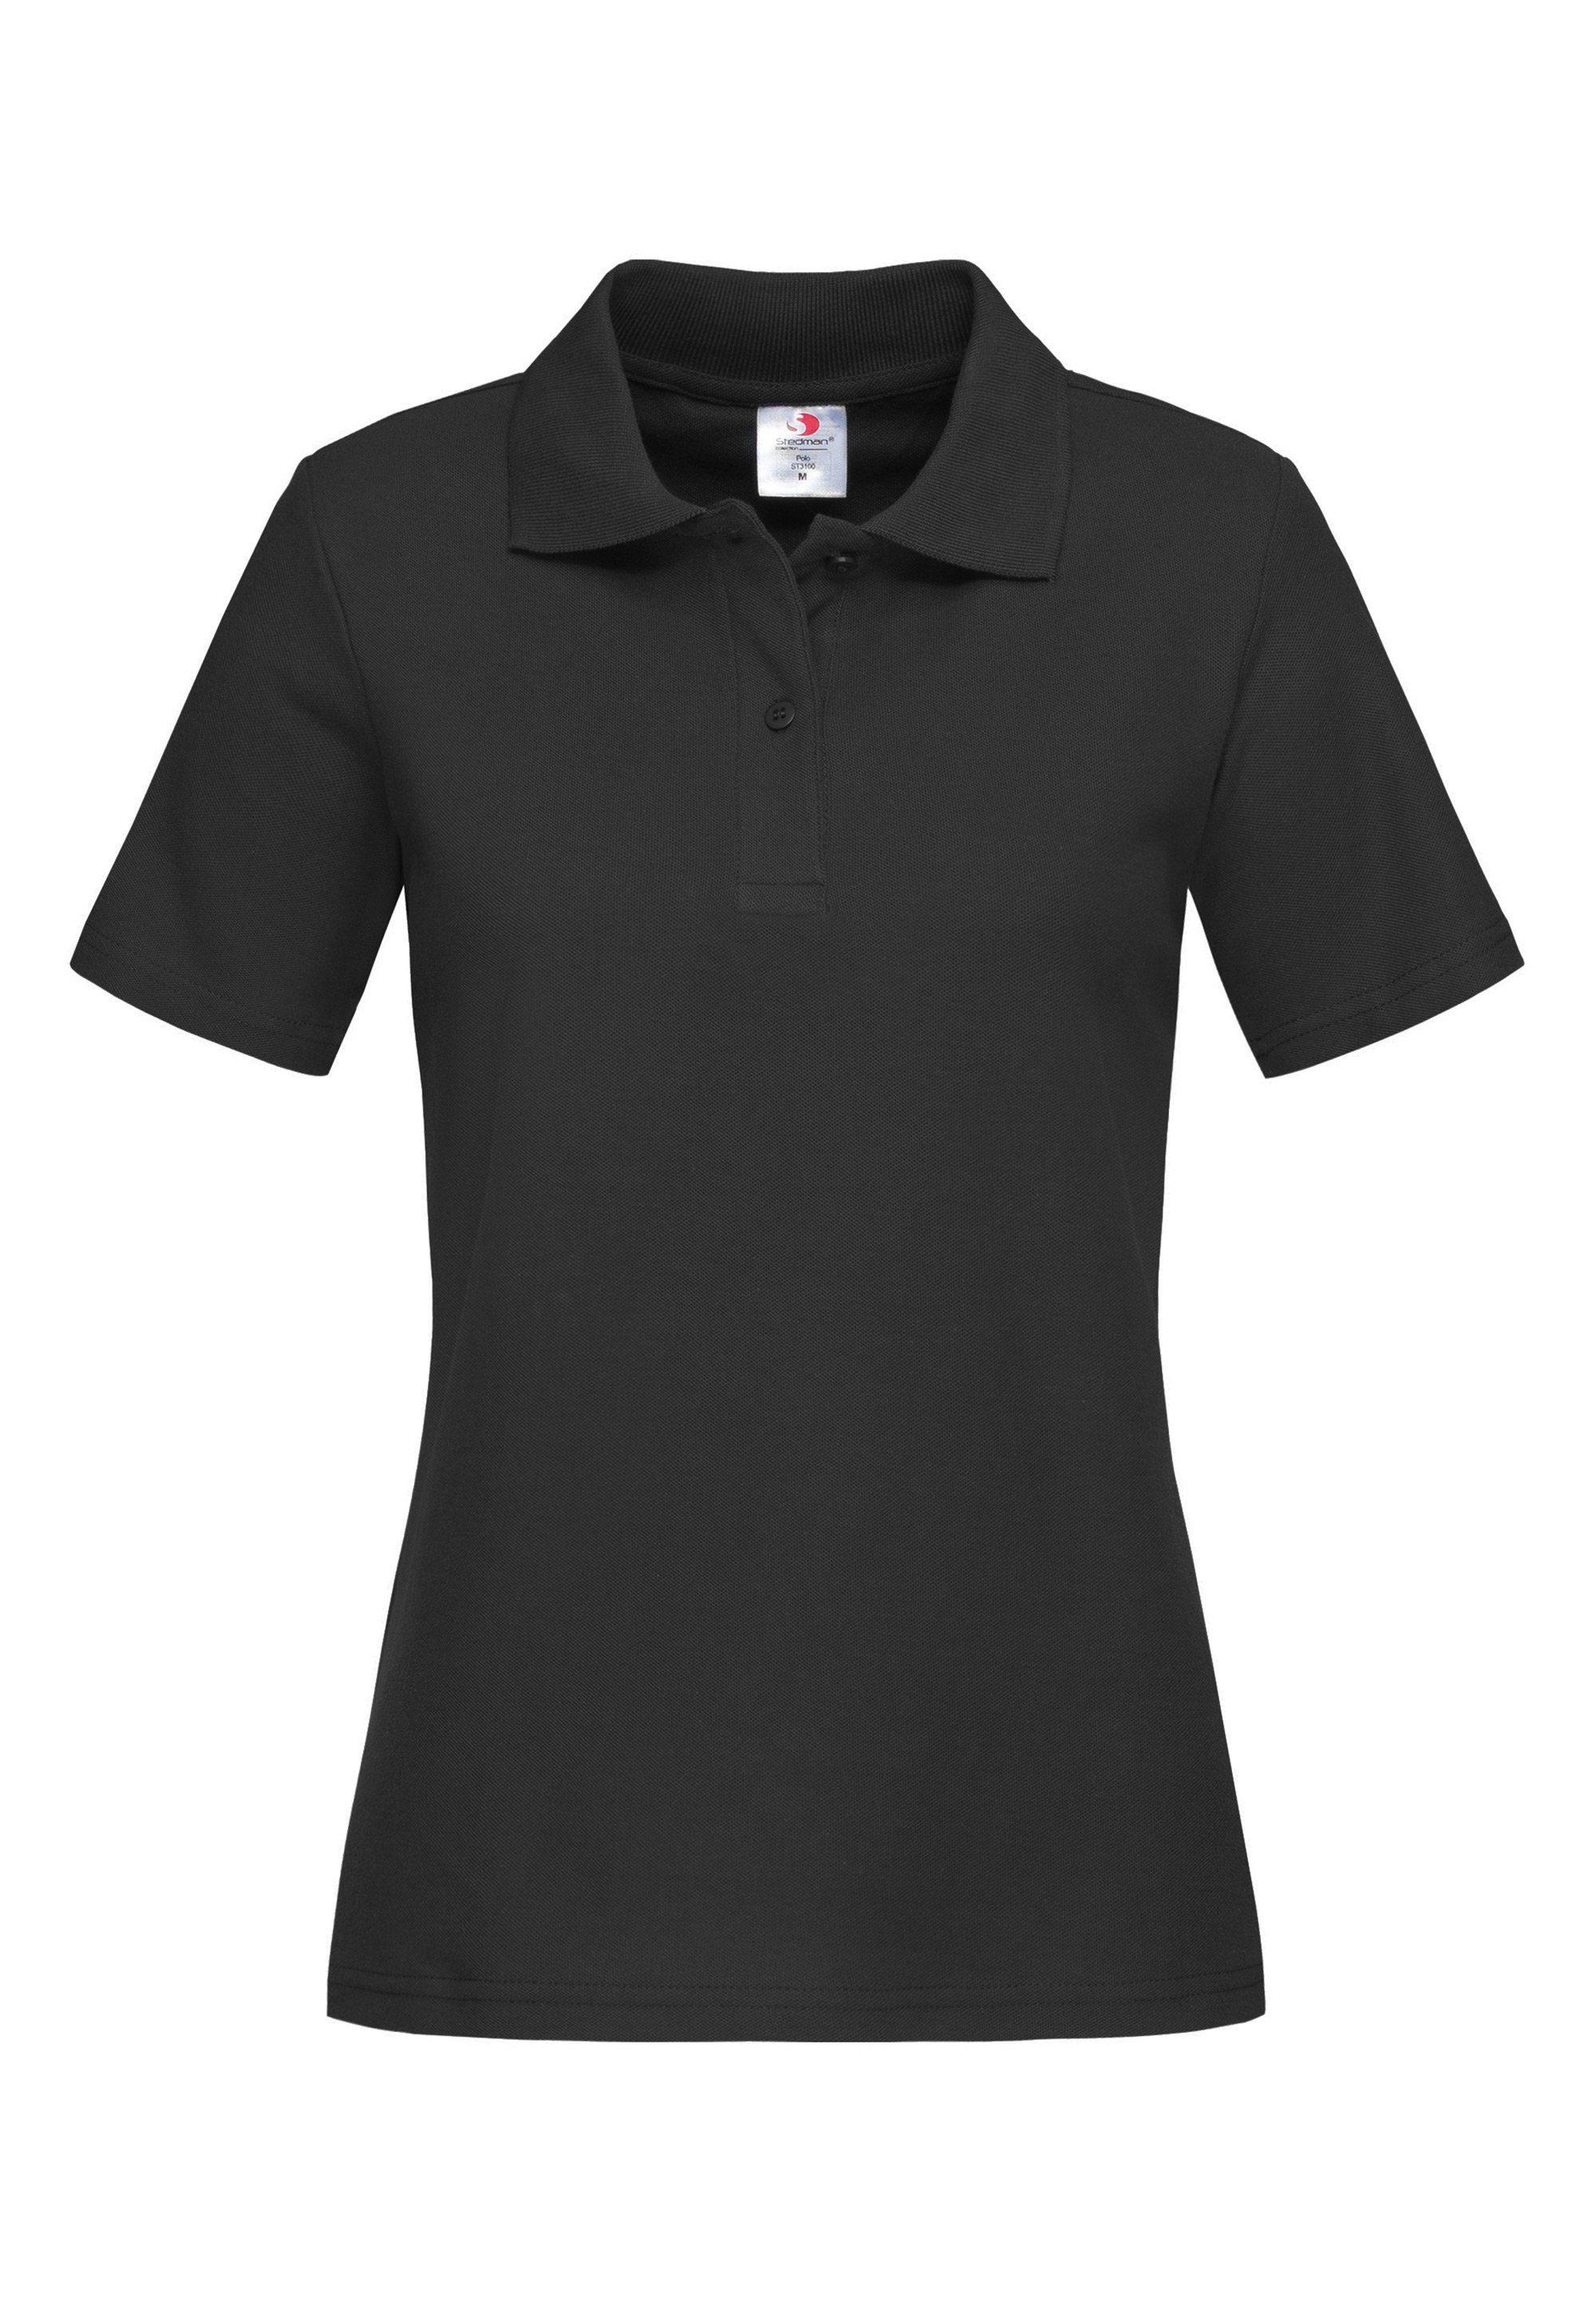 stedman -  Poloshirt im Piqué-Look